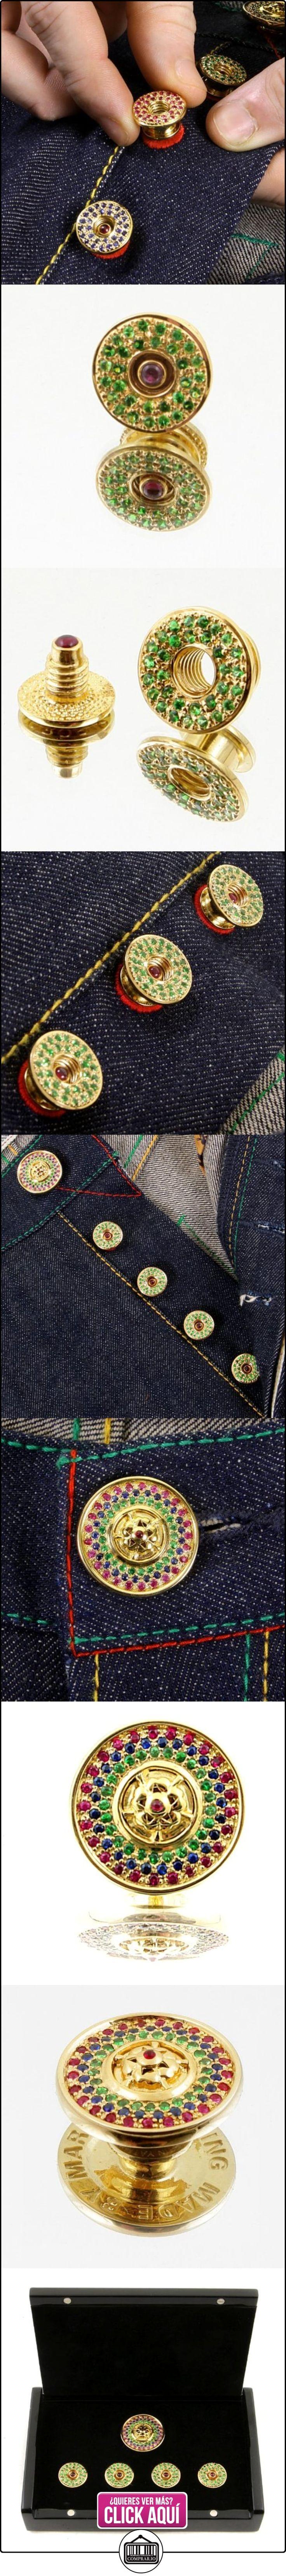 RMC Martin Ksohoh Verde de piedras preciosas granate Custom Made botón, 4unidades, en caja de regalo rmc2380, Green Garnet, talla única  ✿ Joyas para hombres especiales - lujo ✿ ▬► Ver oferta: https://comprar.io/goto/B00HWRDZ06